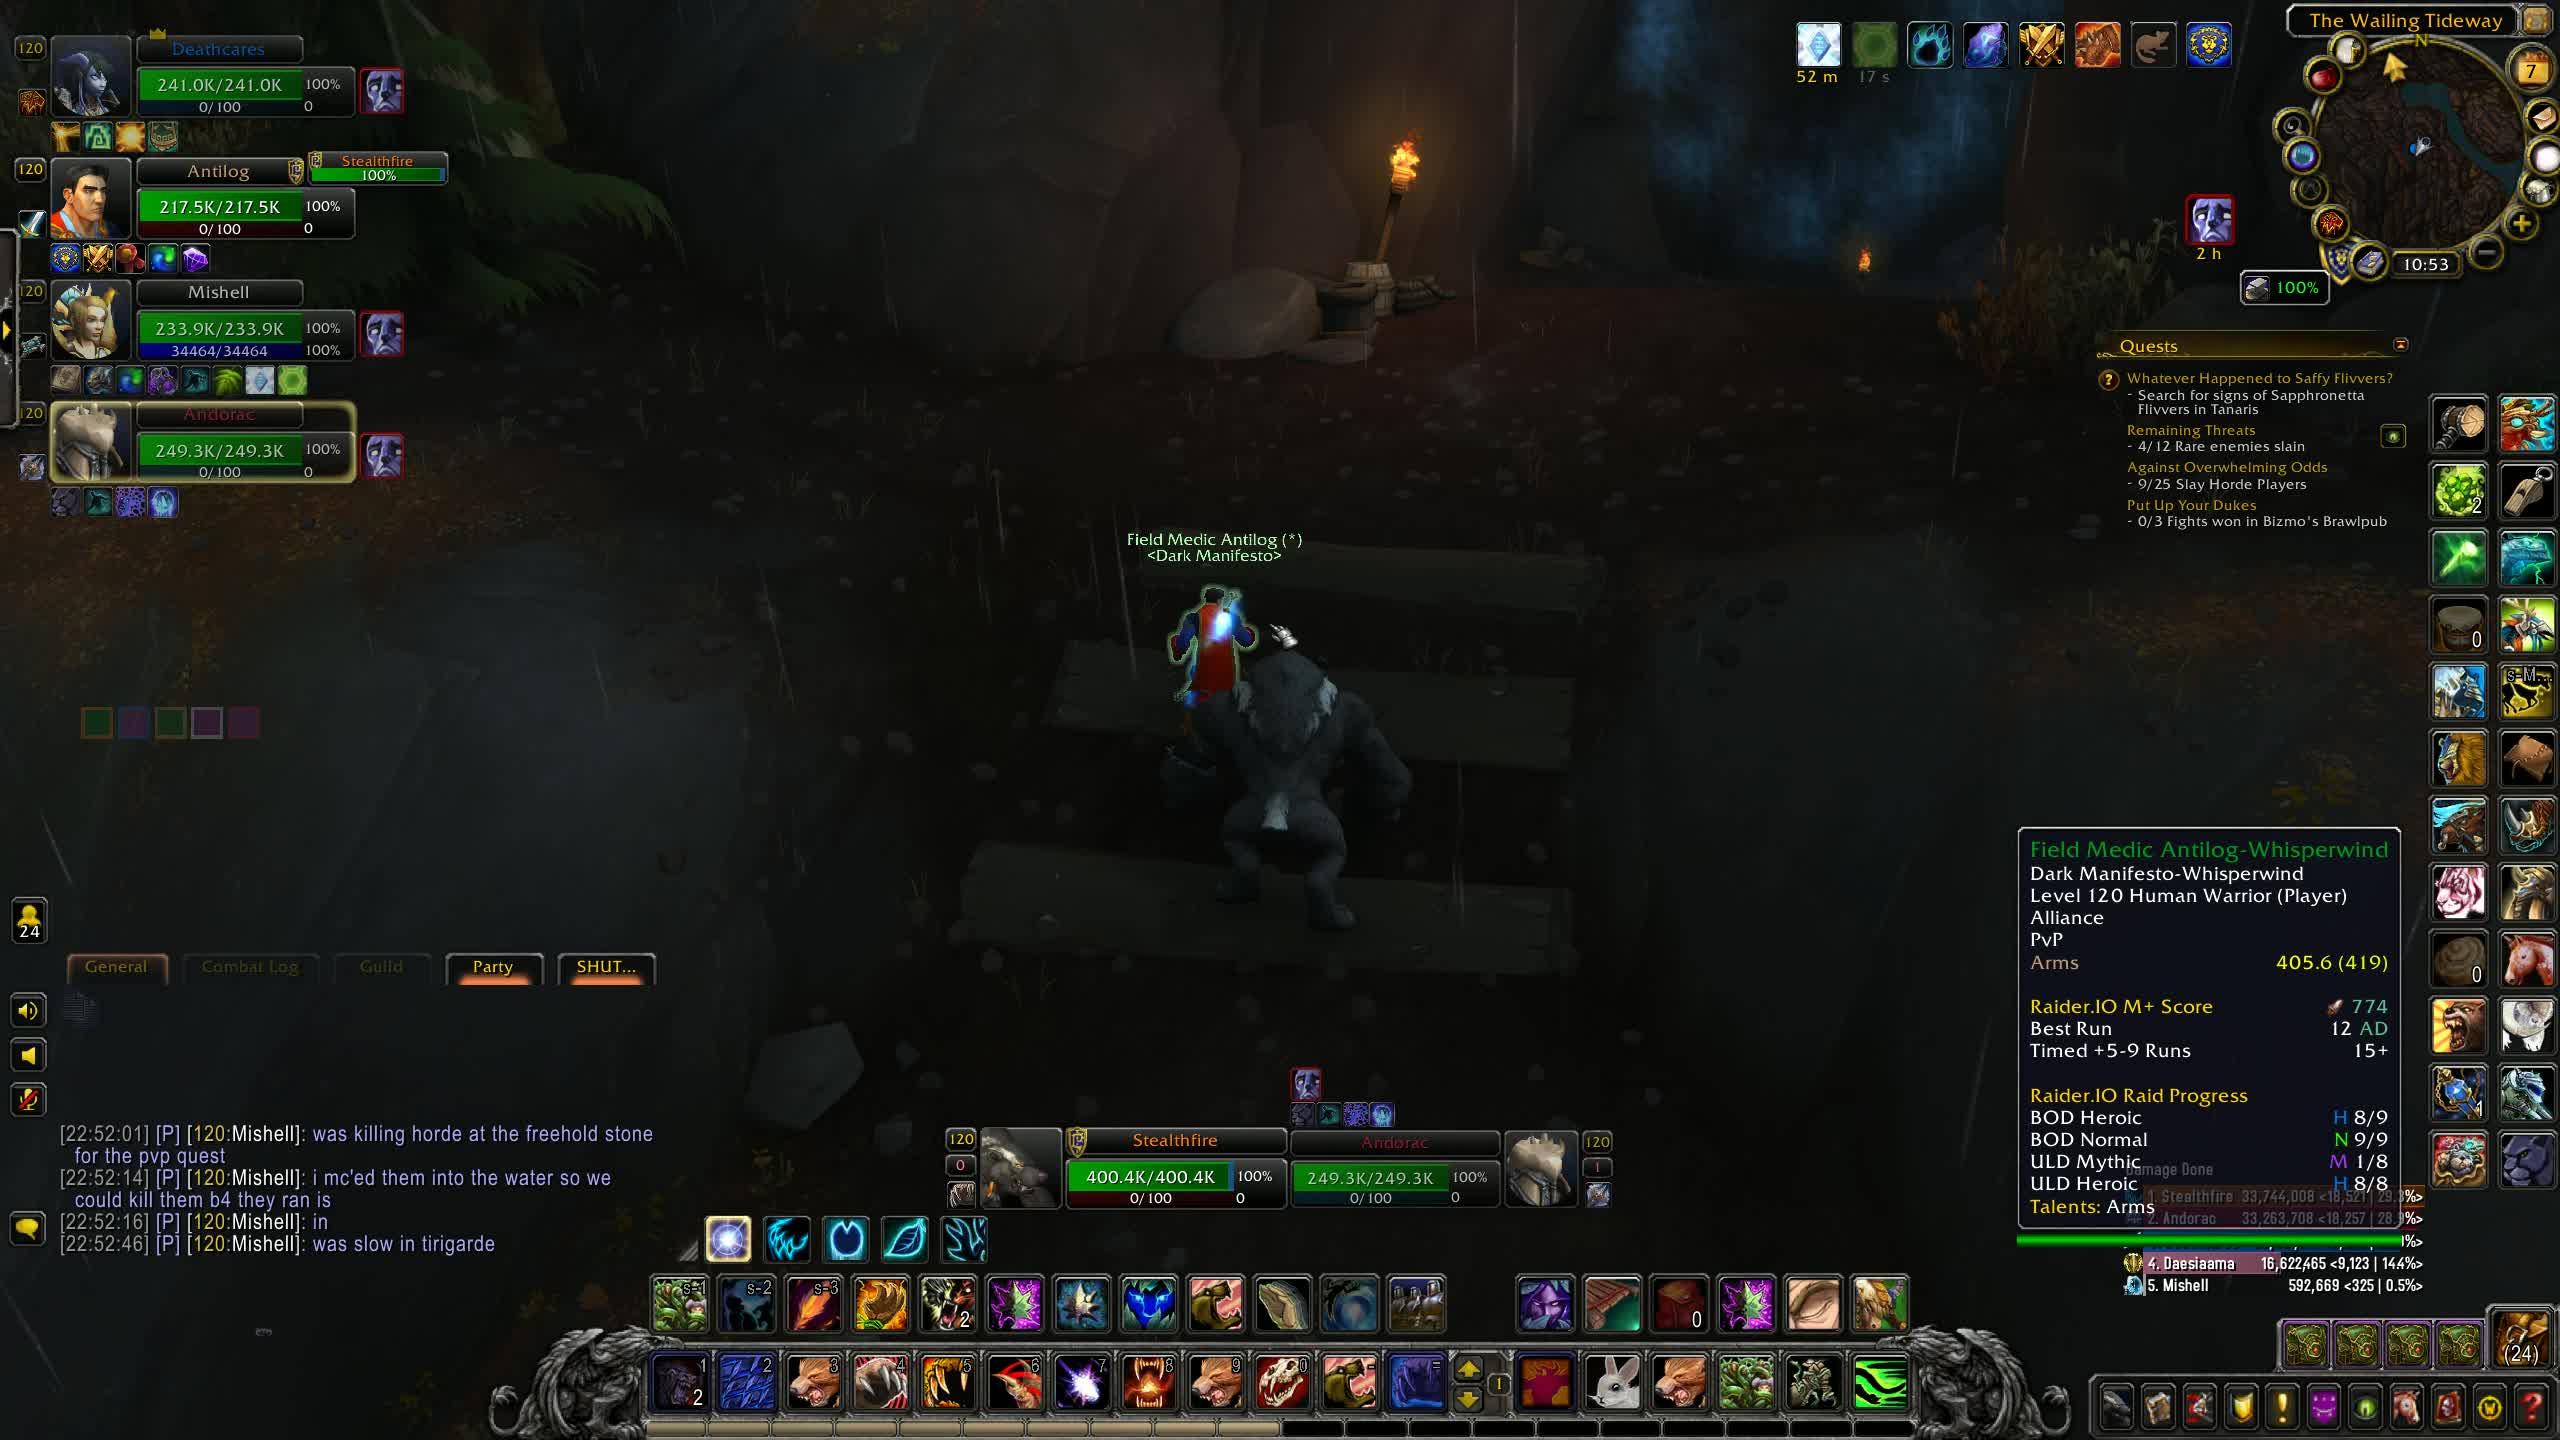 worldofwarcraft, World Of Warcraft 2019.04.07 - 22.53.45.03.DVR GIFs